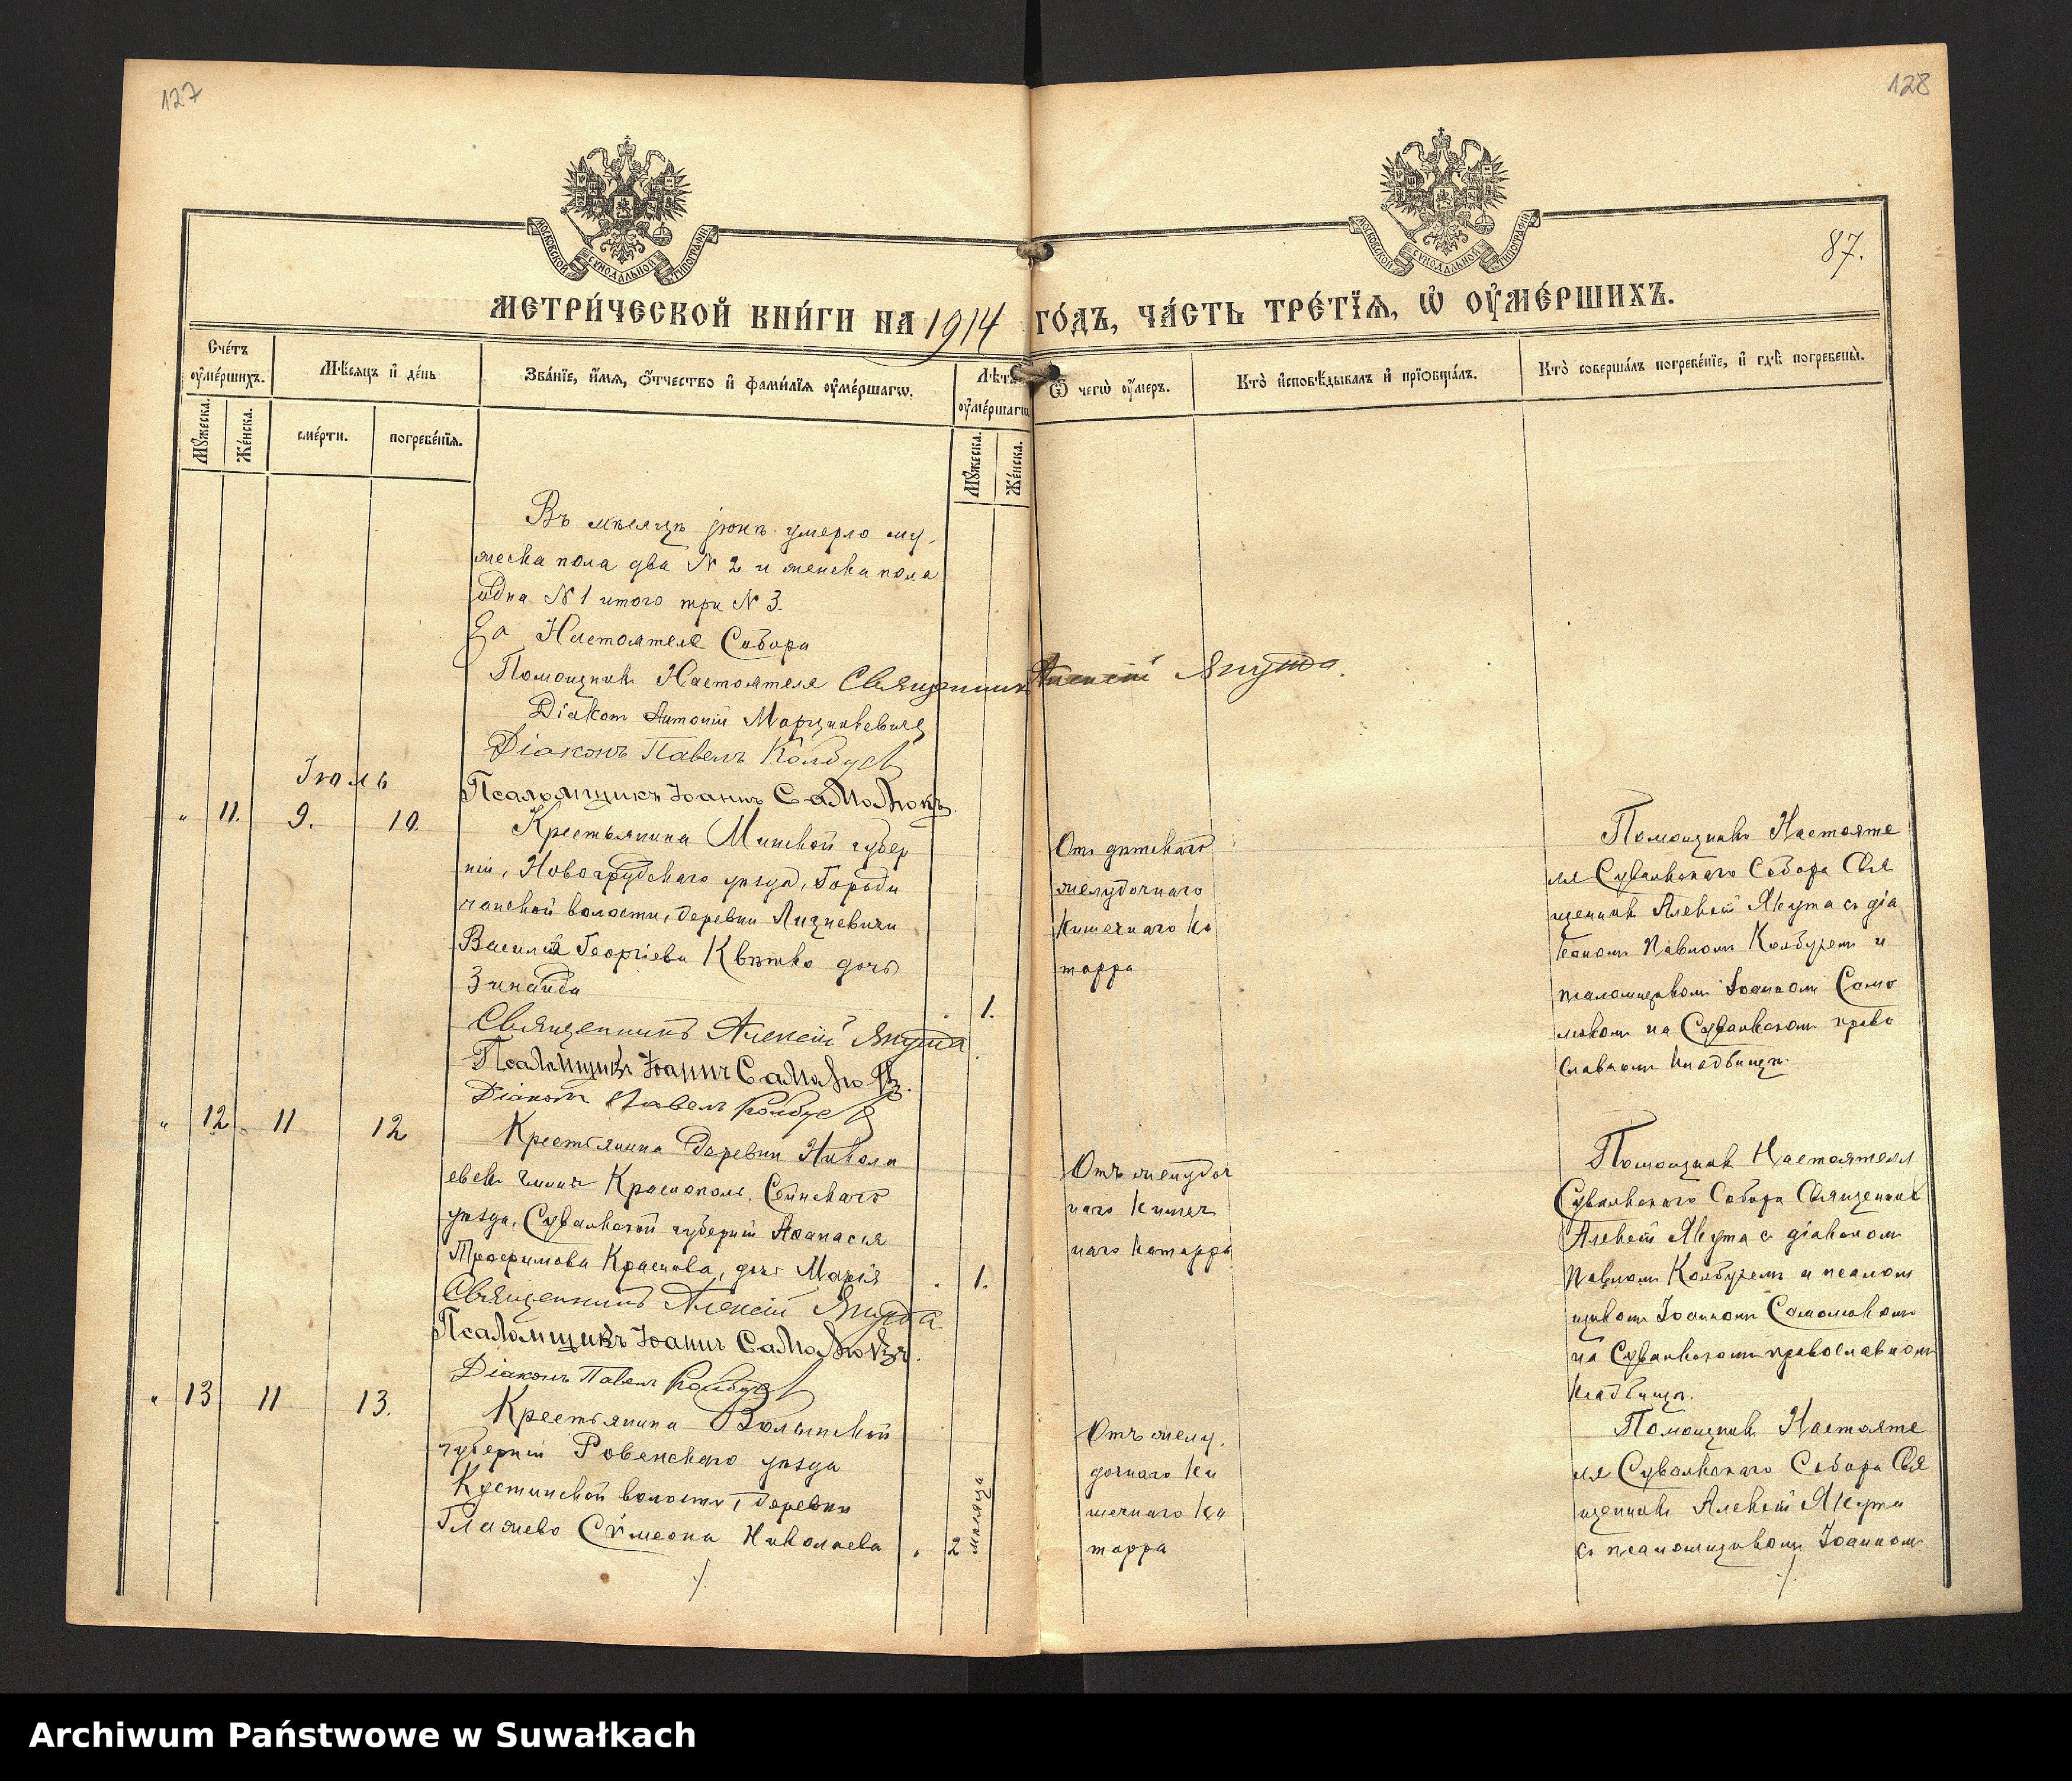 Skan z jednostki: Kopija Metričeskaja kniga Suvalkskoj Uspenskoj Sobornoj cerkvi za 1914 god